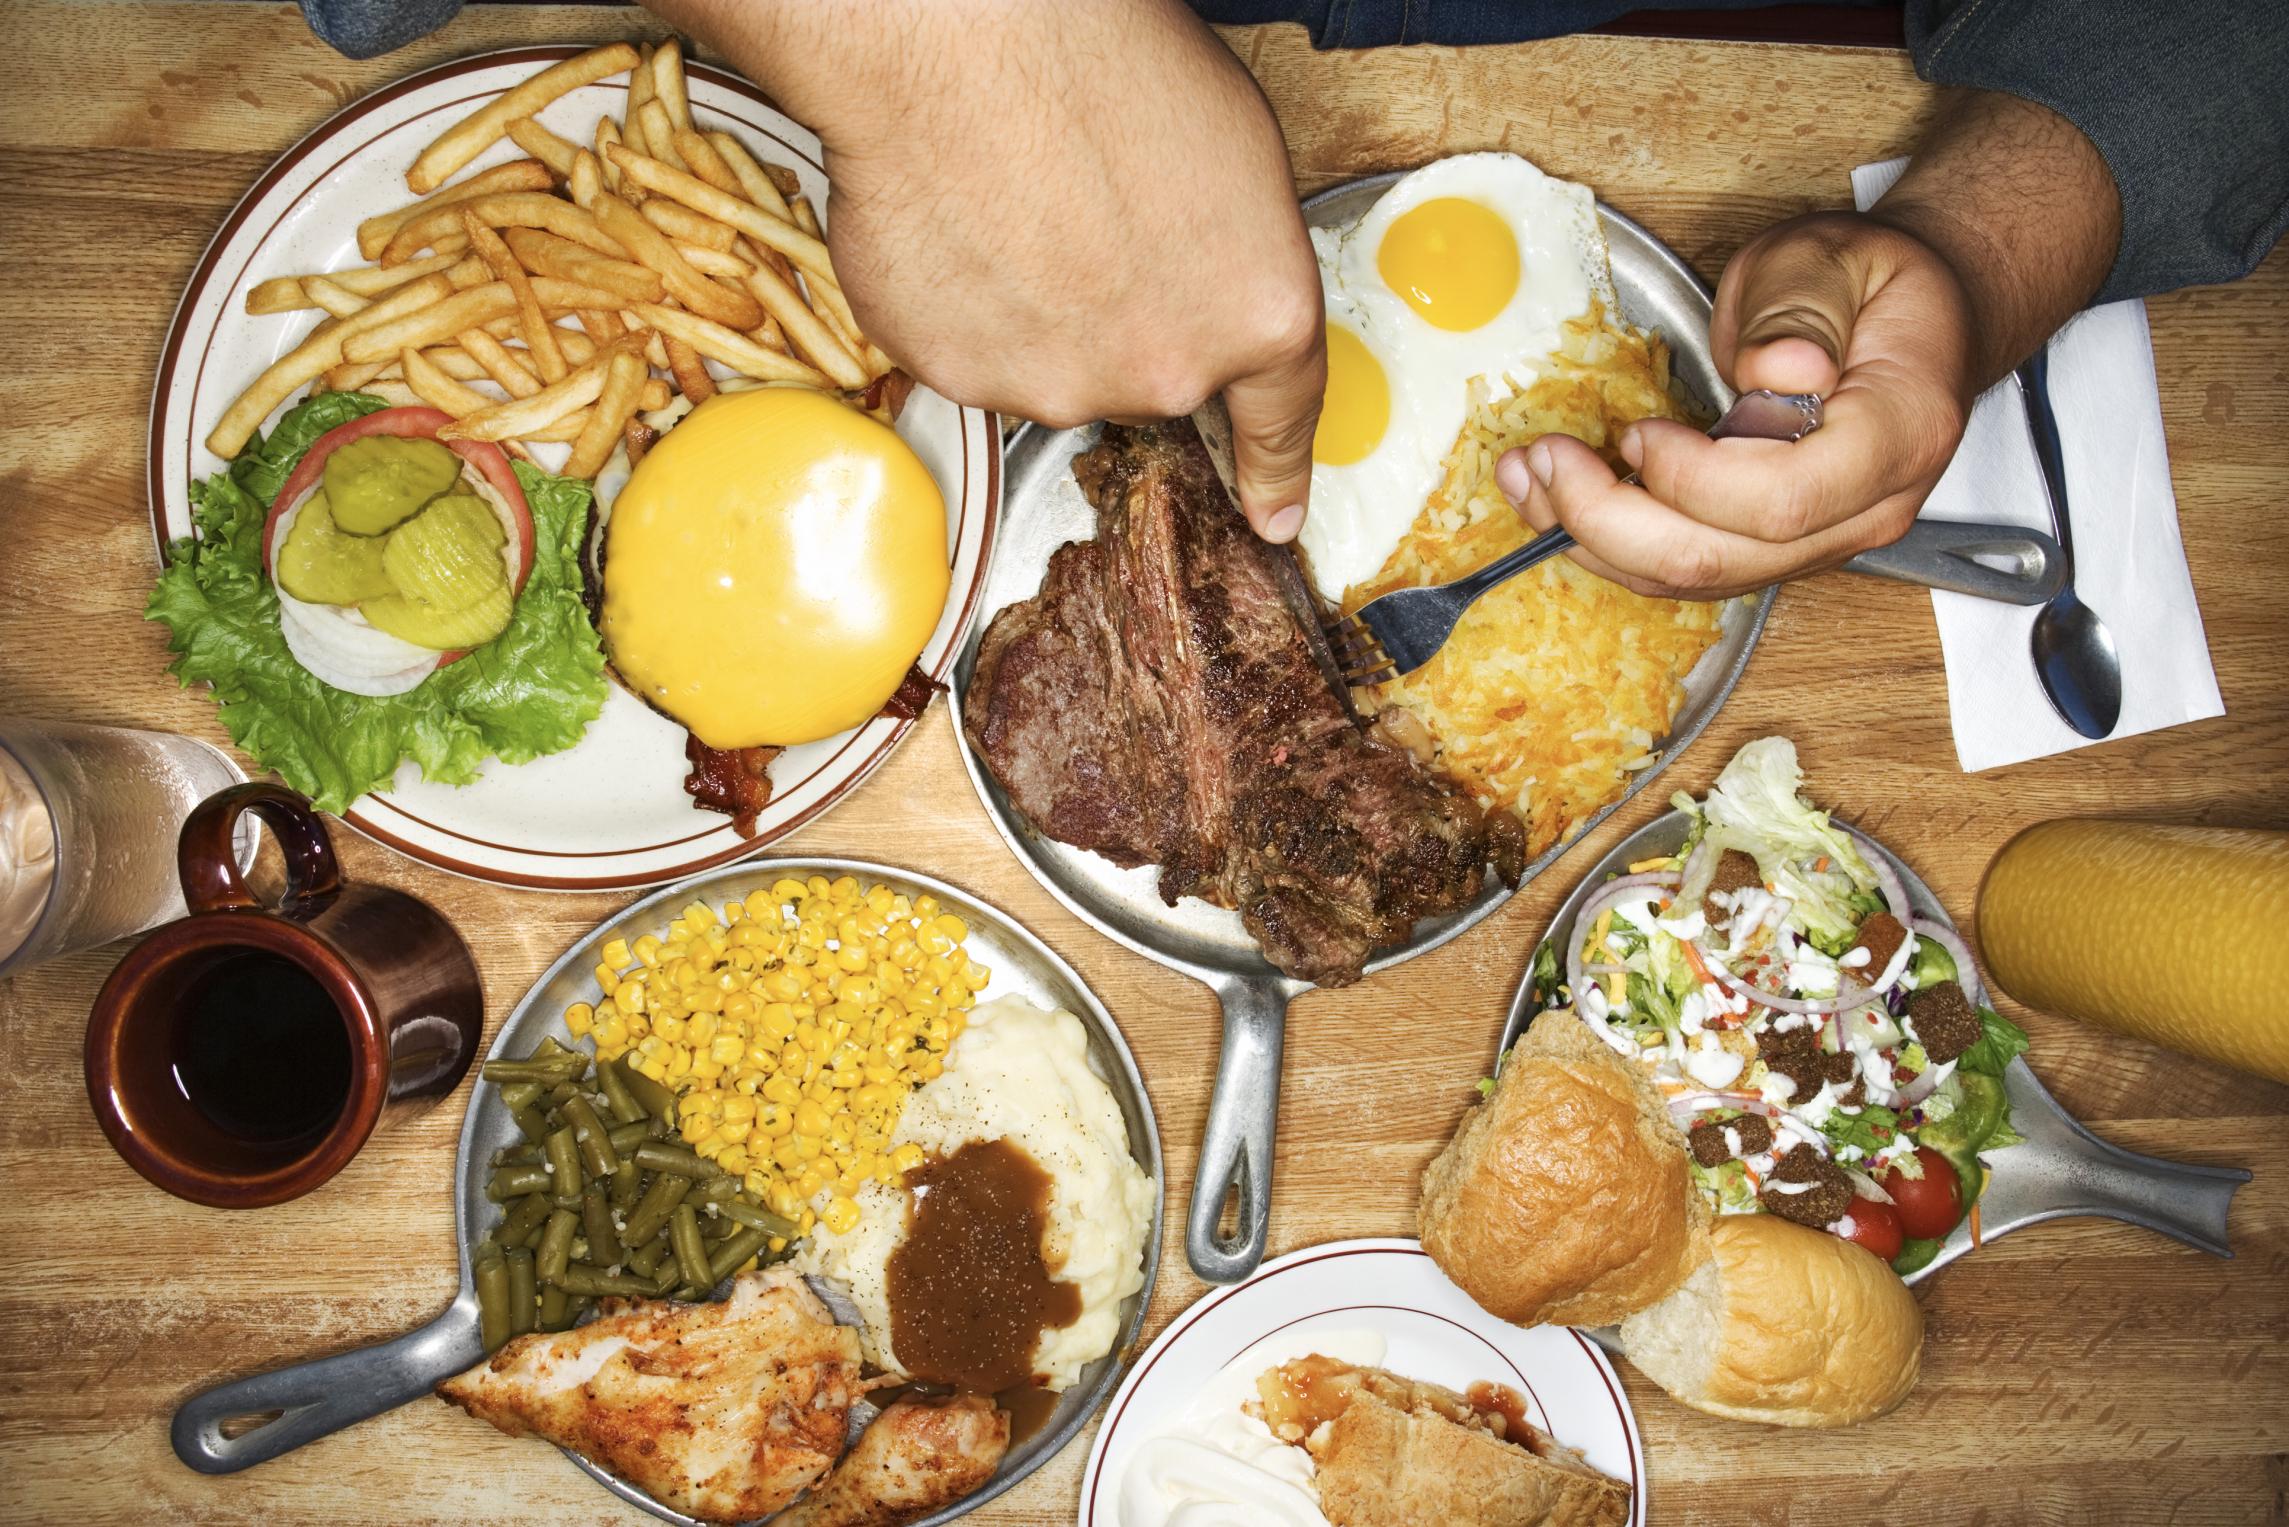 vegetarian 5000 calories diet plan